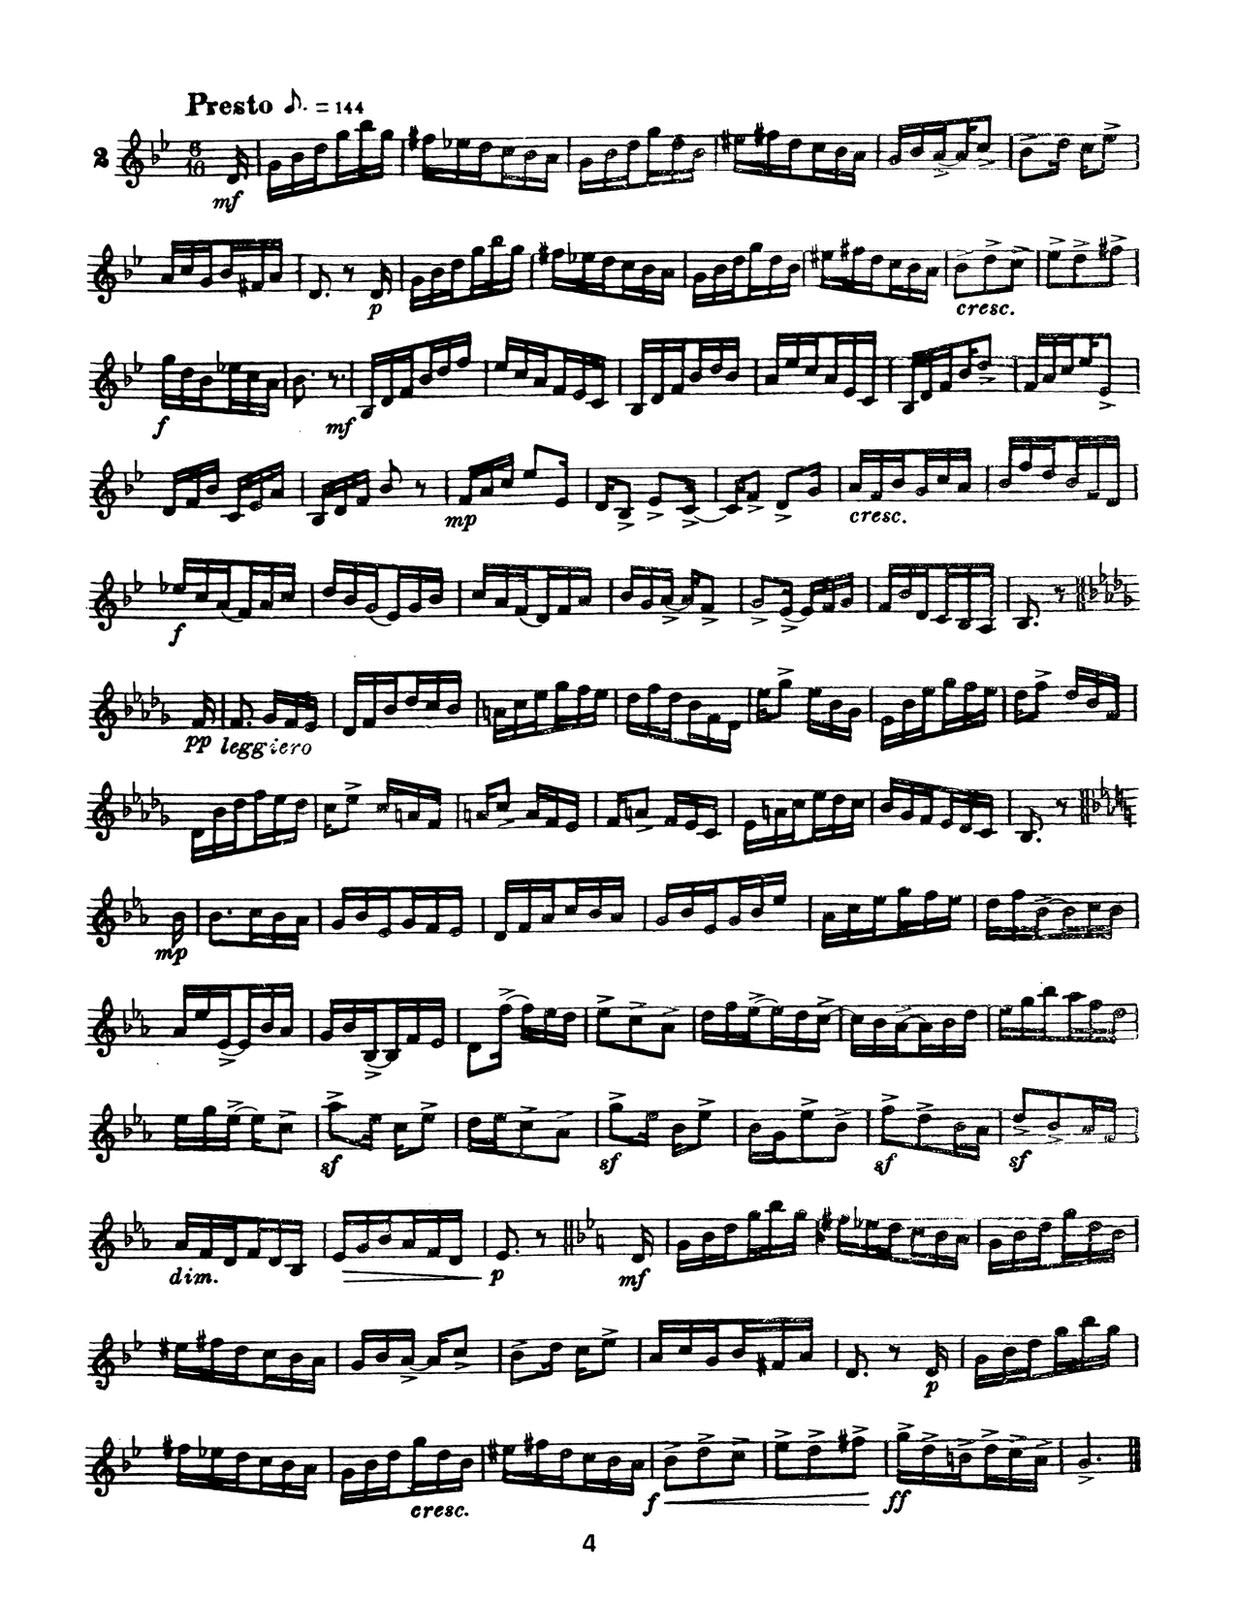 Mancini Rhythm in Technique Letter 4